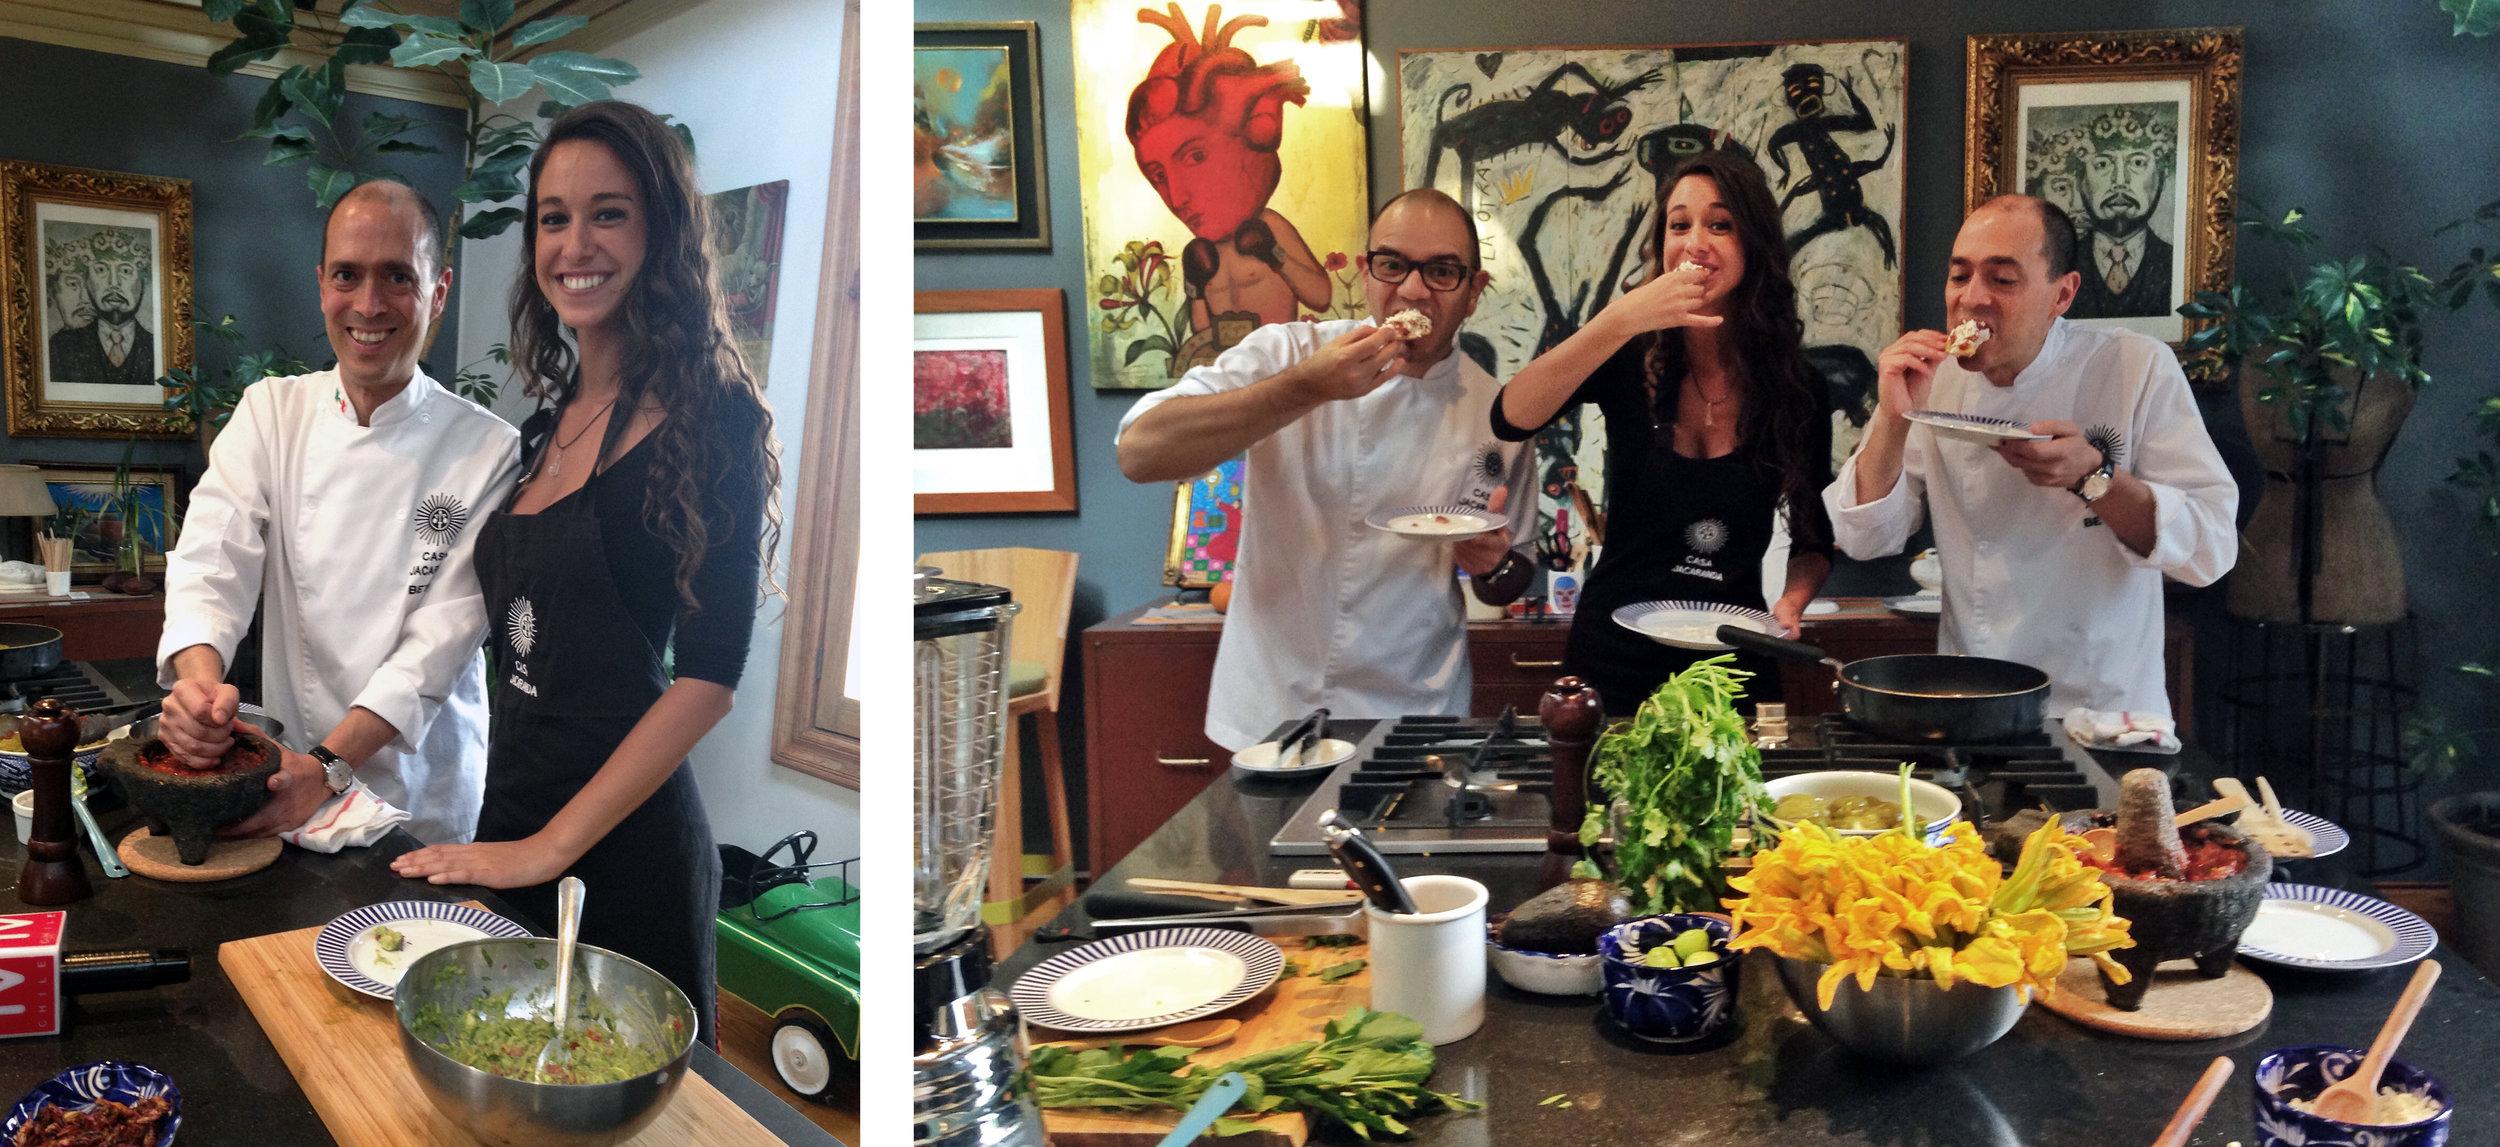 Cami Da Silva with Alberto Estua and Jorge Fitz making Mexican food at Casa Jacaranda